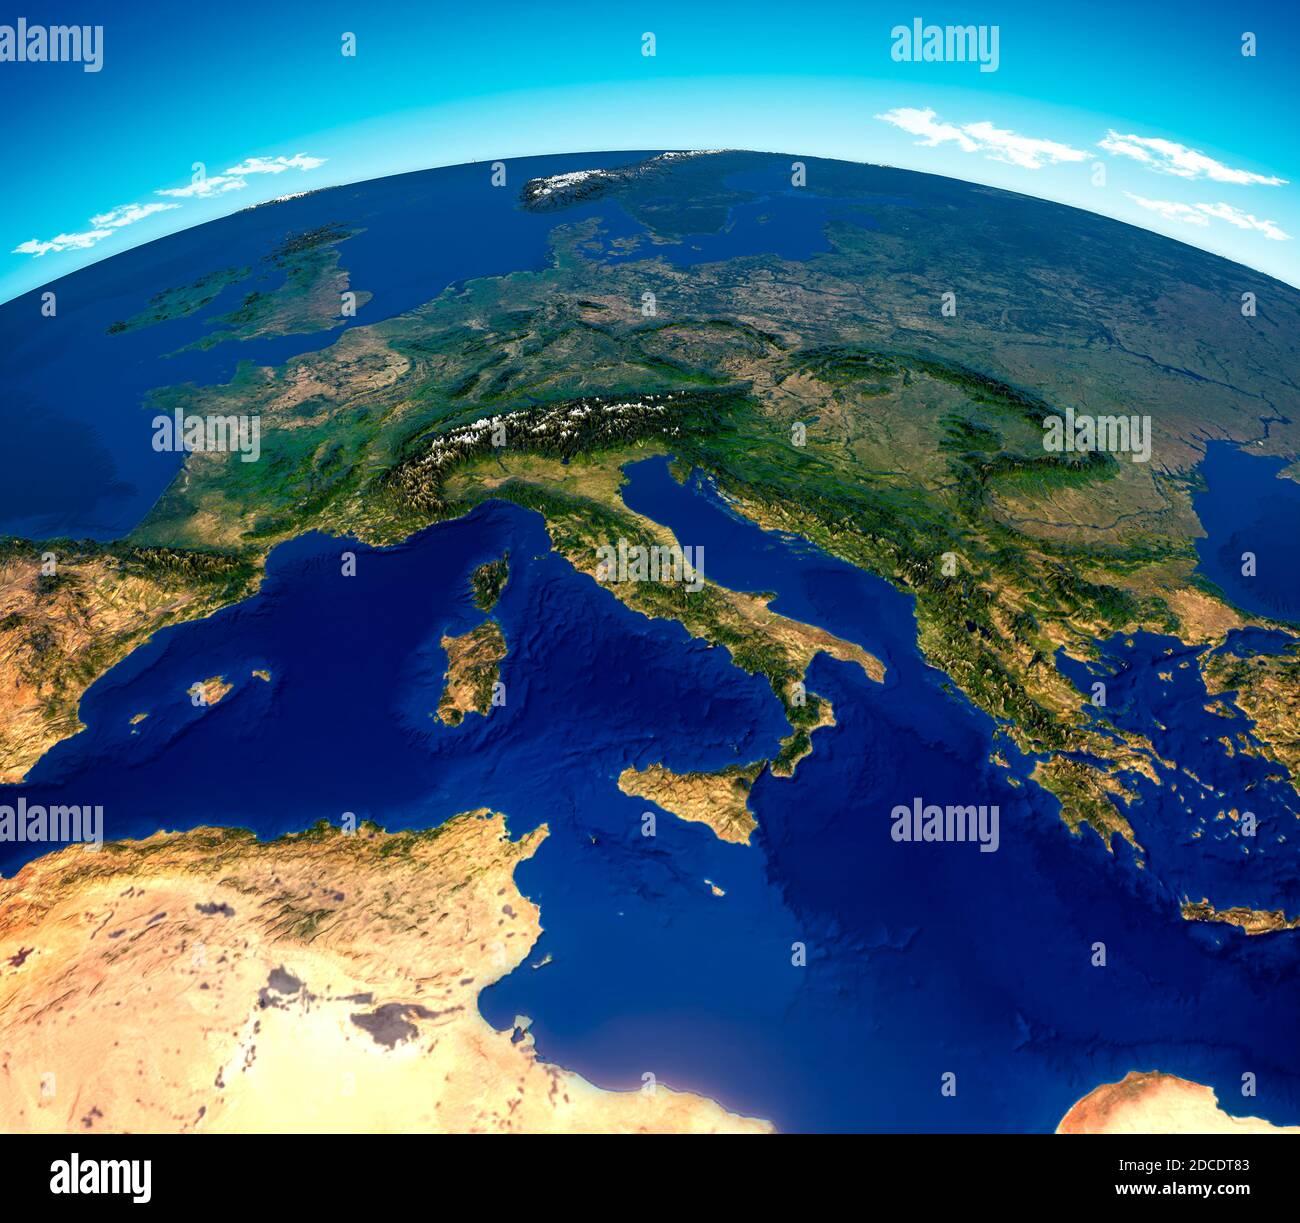 Cartina Satellitare Sardegna.Vista Satellitare Sardegna Immagini E Fotos Stock Alamy